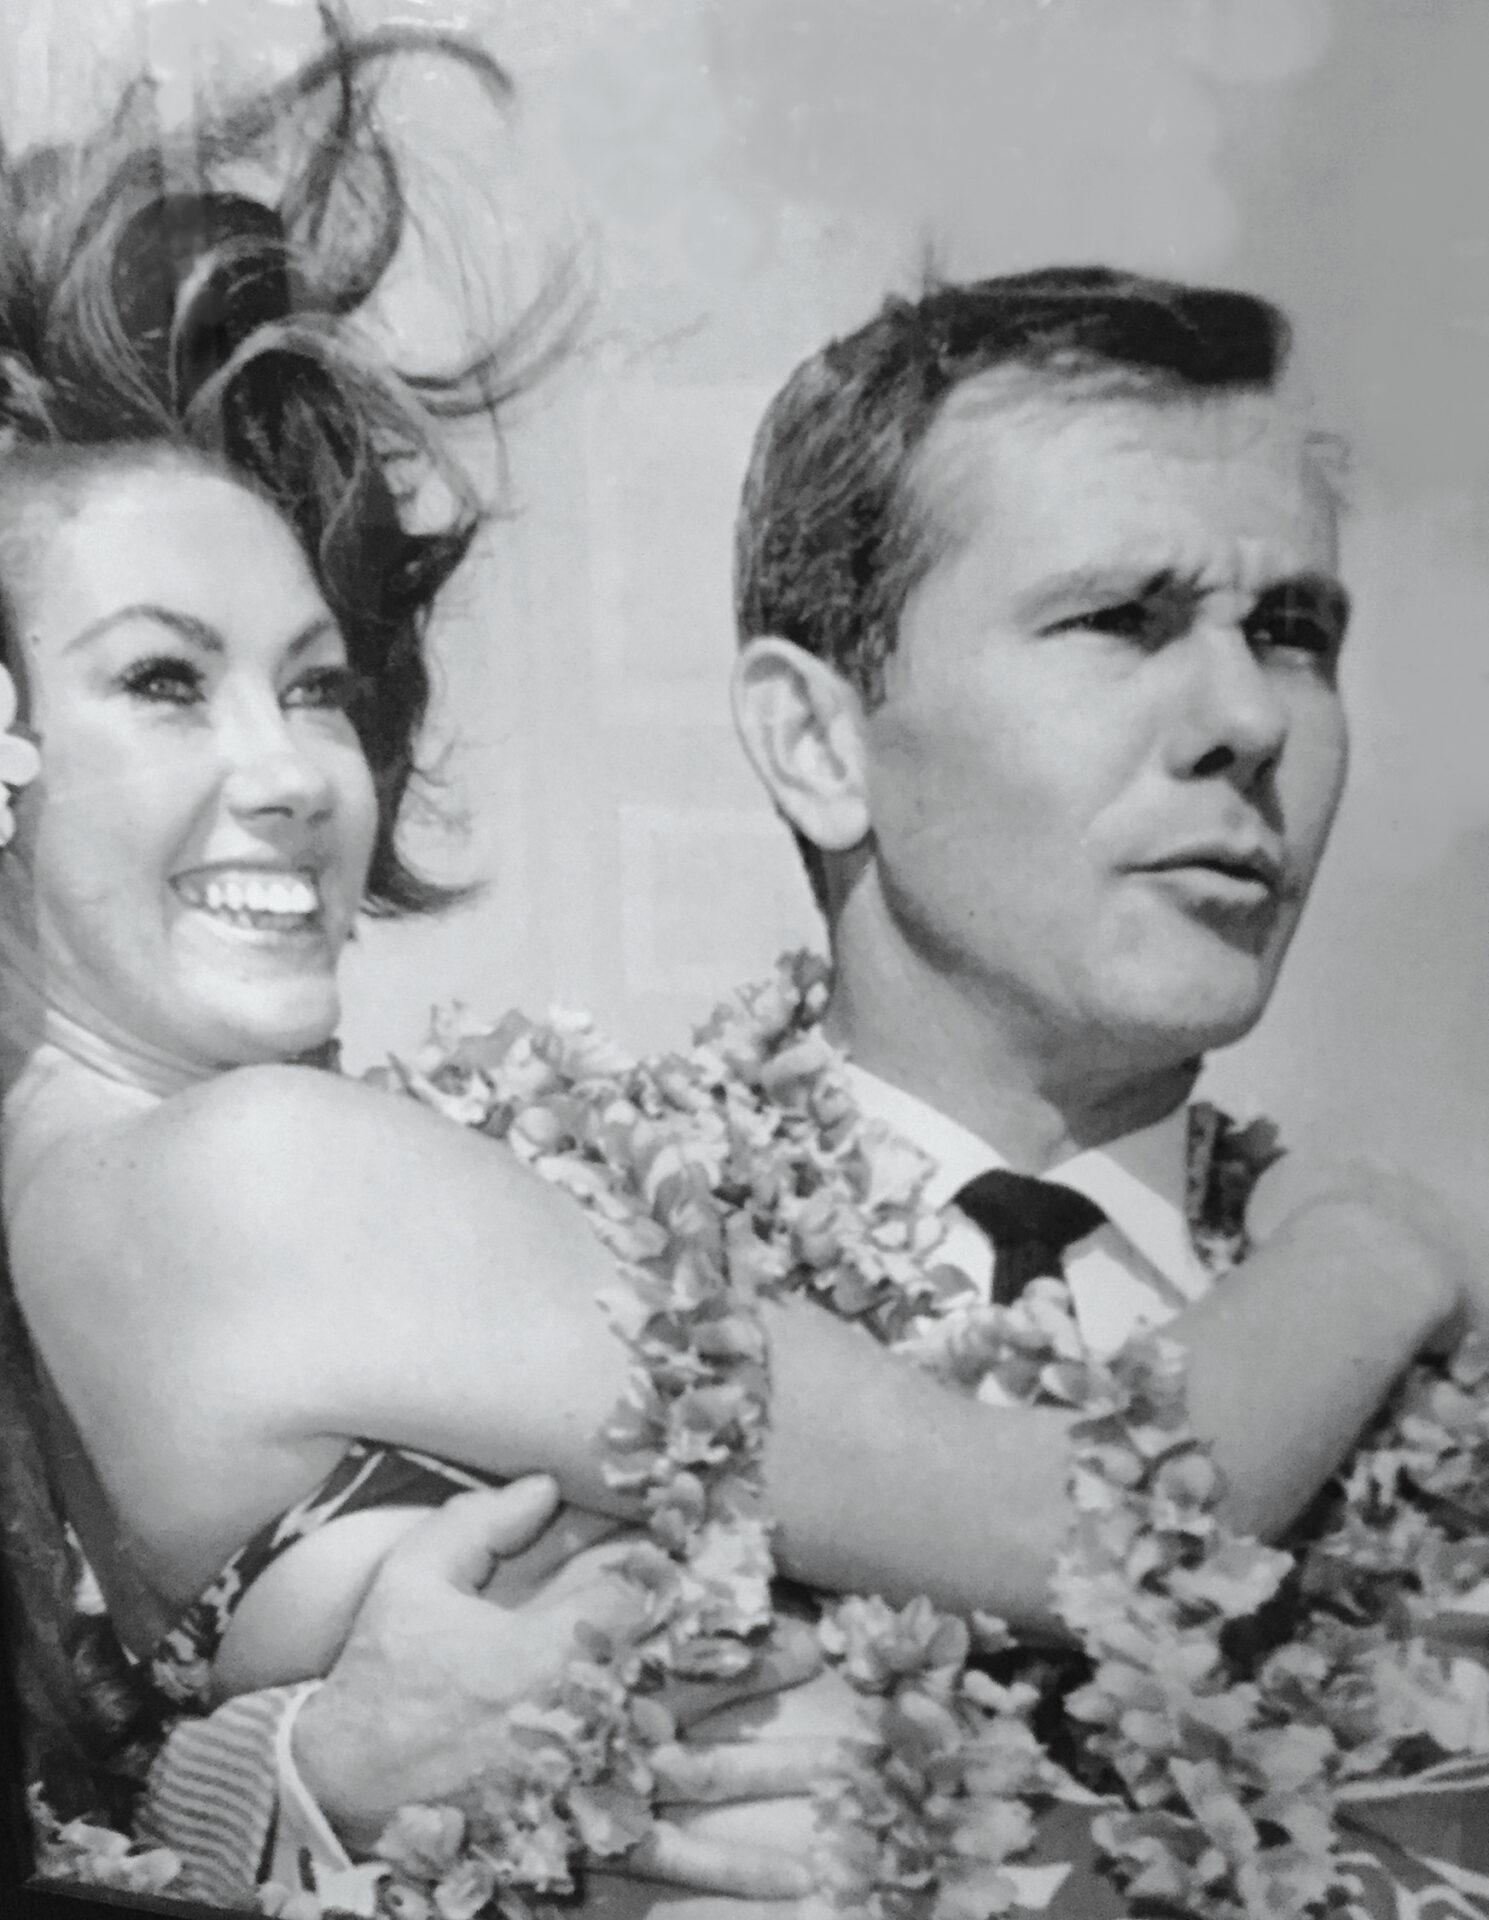 johnny-carson-mystery-girl-sally-sewell-Mai-Kai-Restaurant-Tiki-Culture-Polynesia-Island-Dreams-Tom-Austin-Hukilau-Festival-Fort-Lauderdale-Venice-Magazine